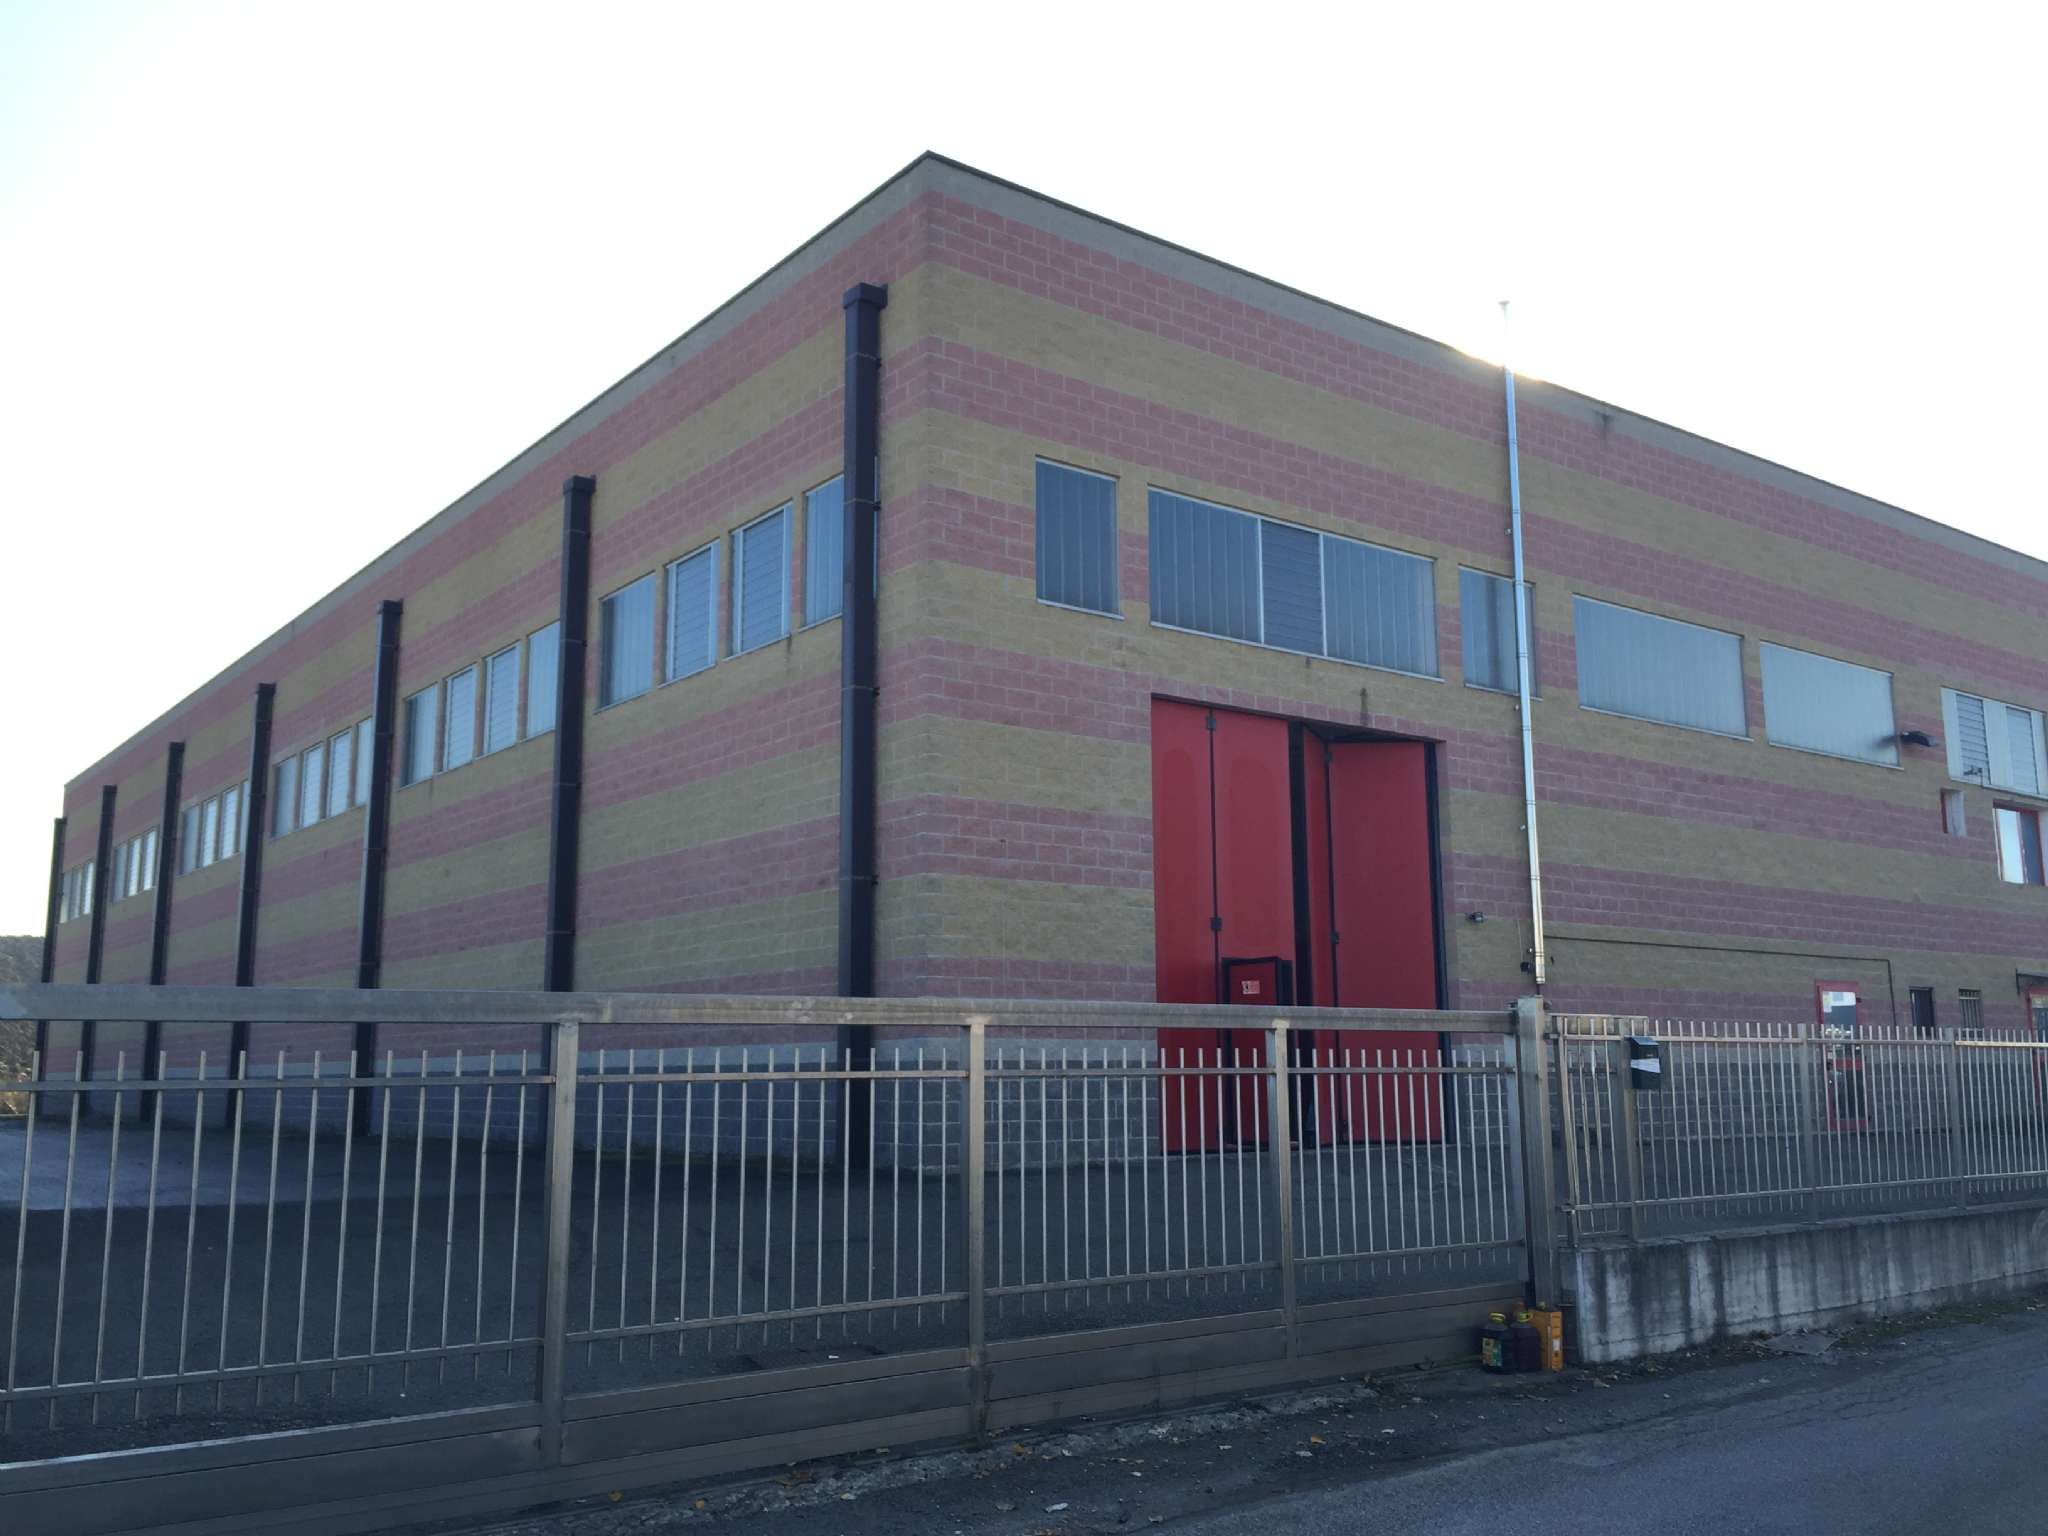 Capannone in vendita a Carbonara Scrivia, 2 locali, Trattative riservate | PortaleAgenzieImmobiliari.it